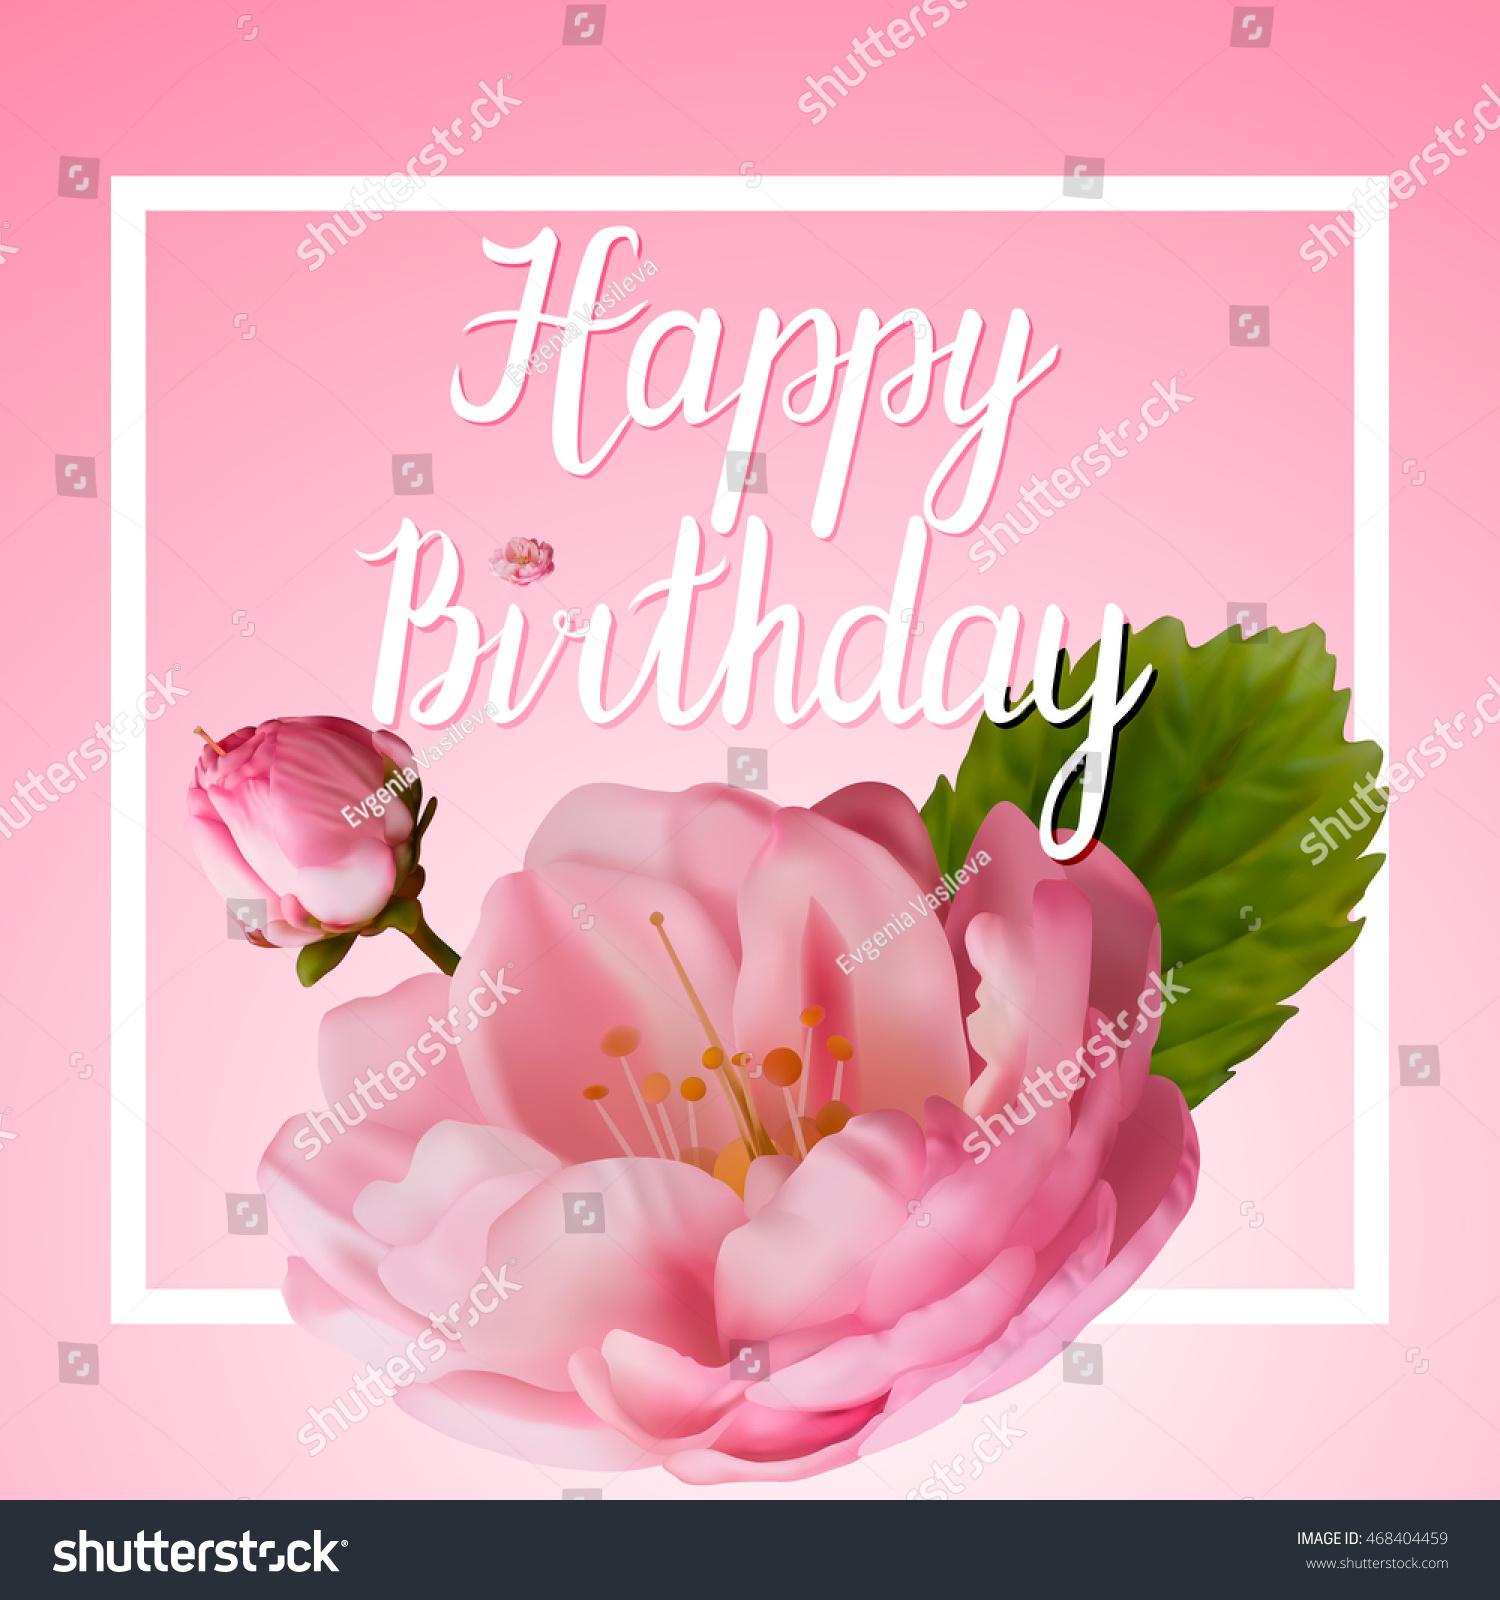 Greeting Card Greetings Happy Birthday Pink Stock Vector Hd Royalty